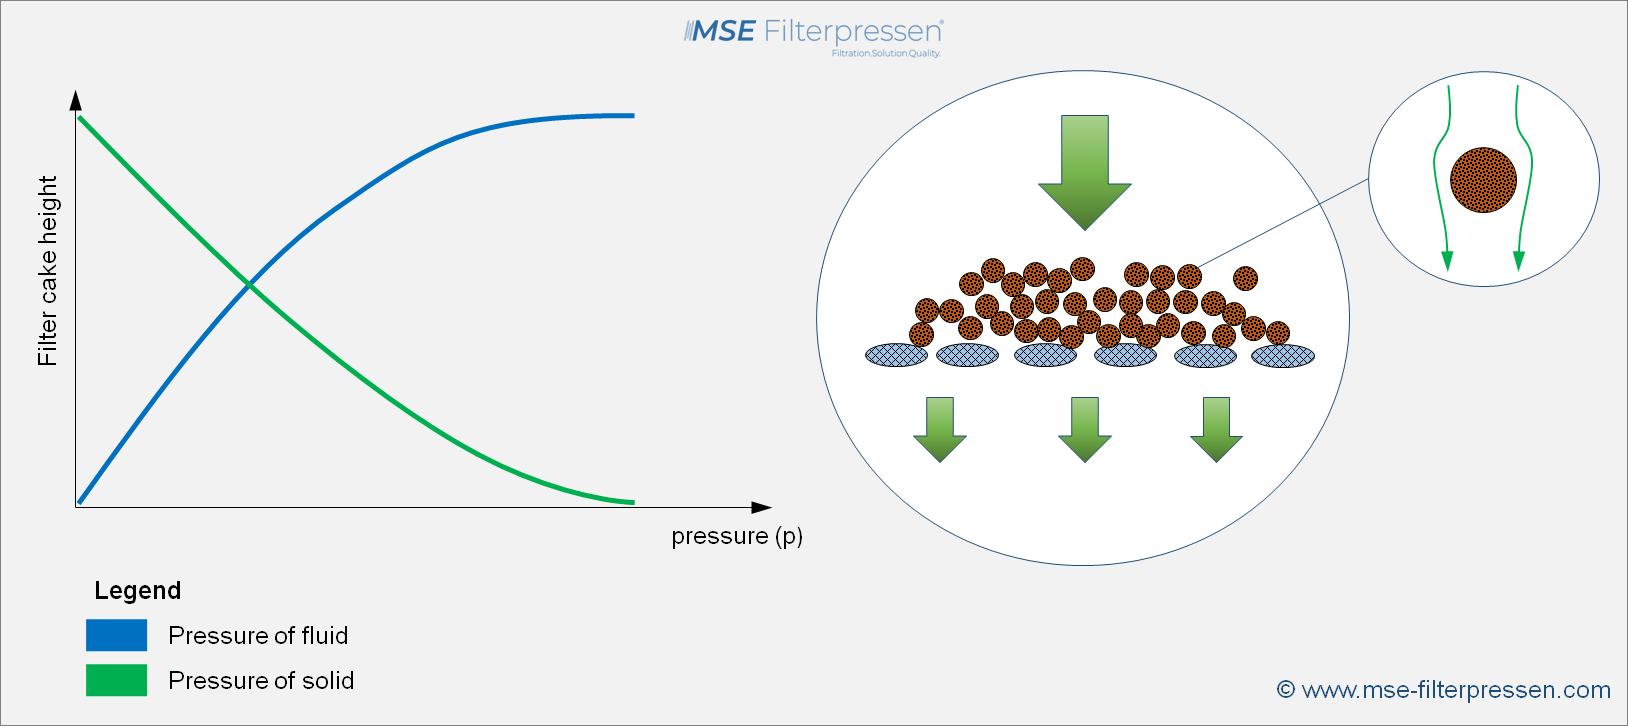 Comparison of solid-liquid pressure in the filter cake